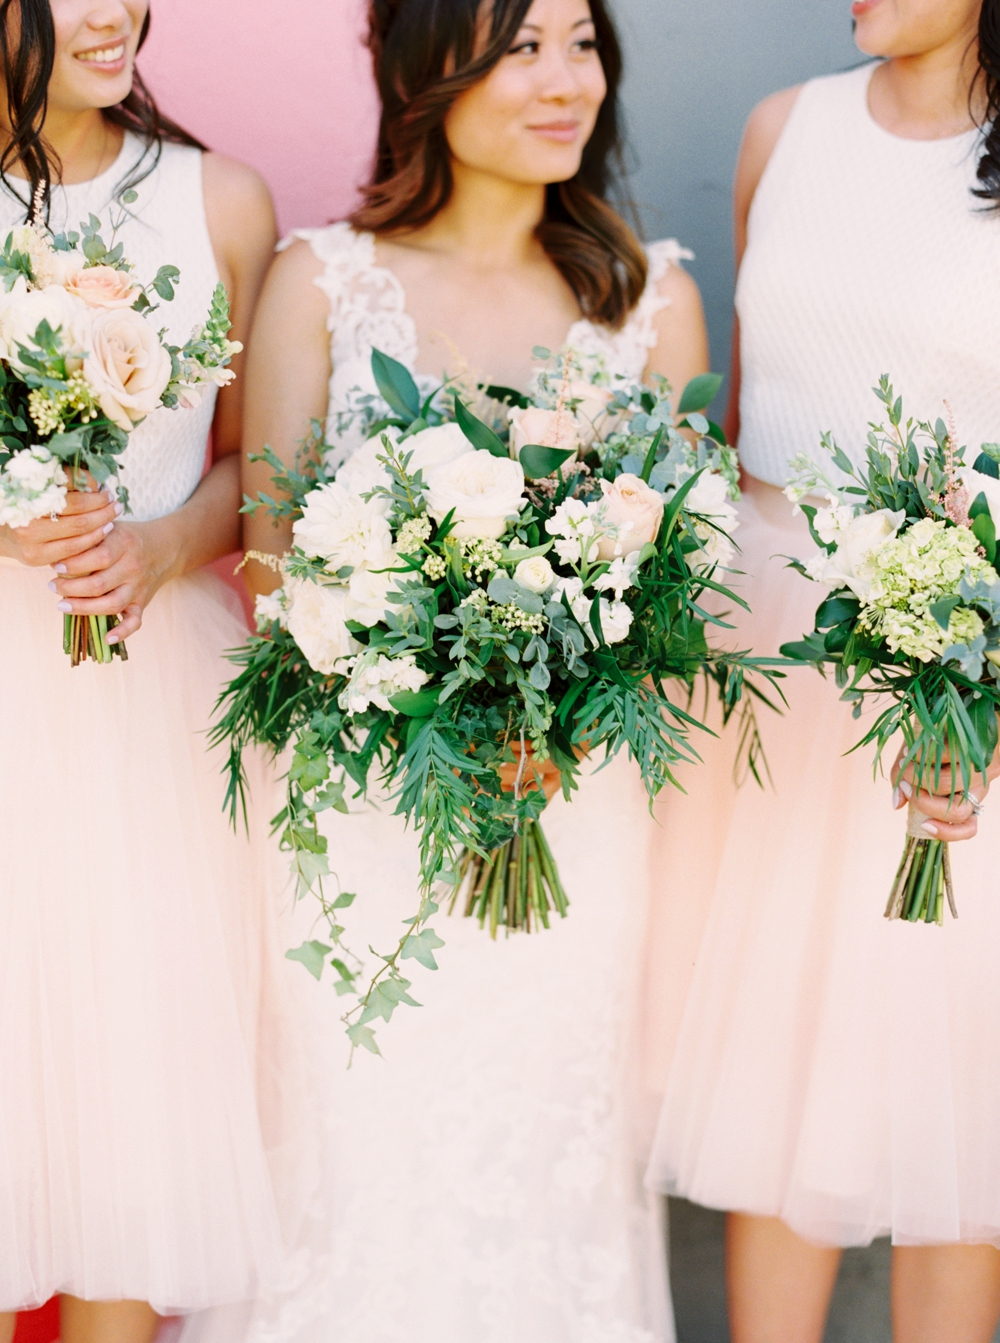 Calgary Wedding Photographer | Meadow Muse Pavilion Wedding | Canmore Photographers | Fish Creek Park | Bridesmaids blush pink croptop and skirt